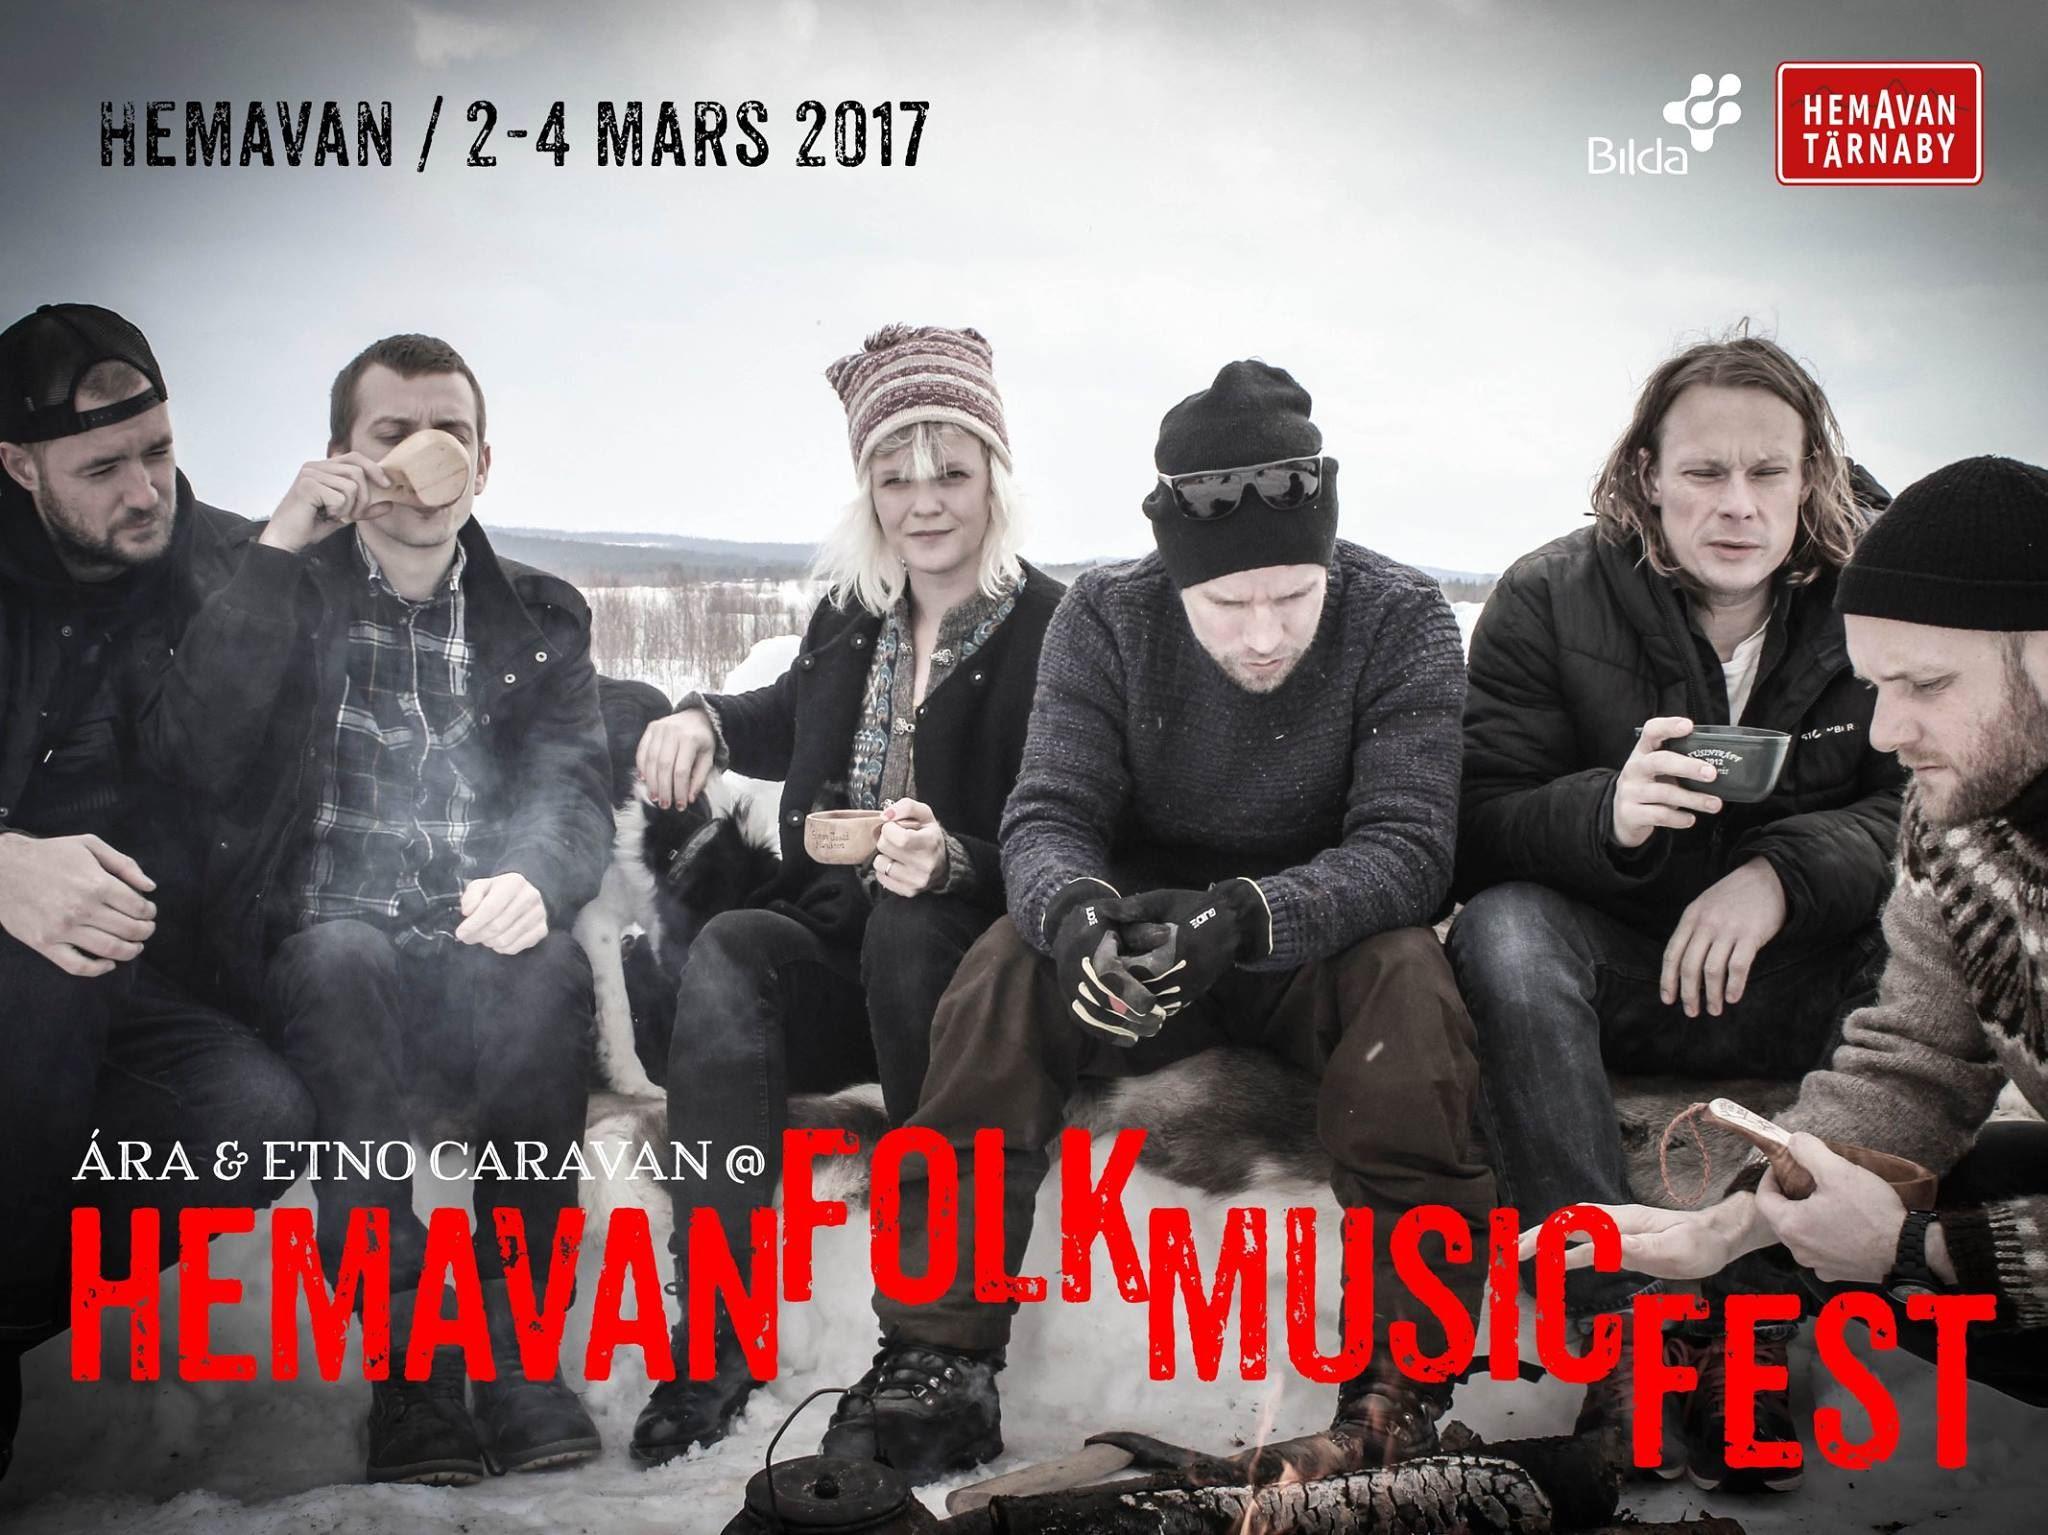 Hemavan Folk Music Fest